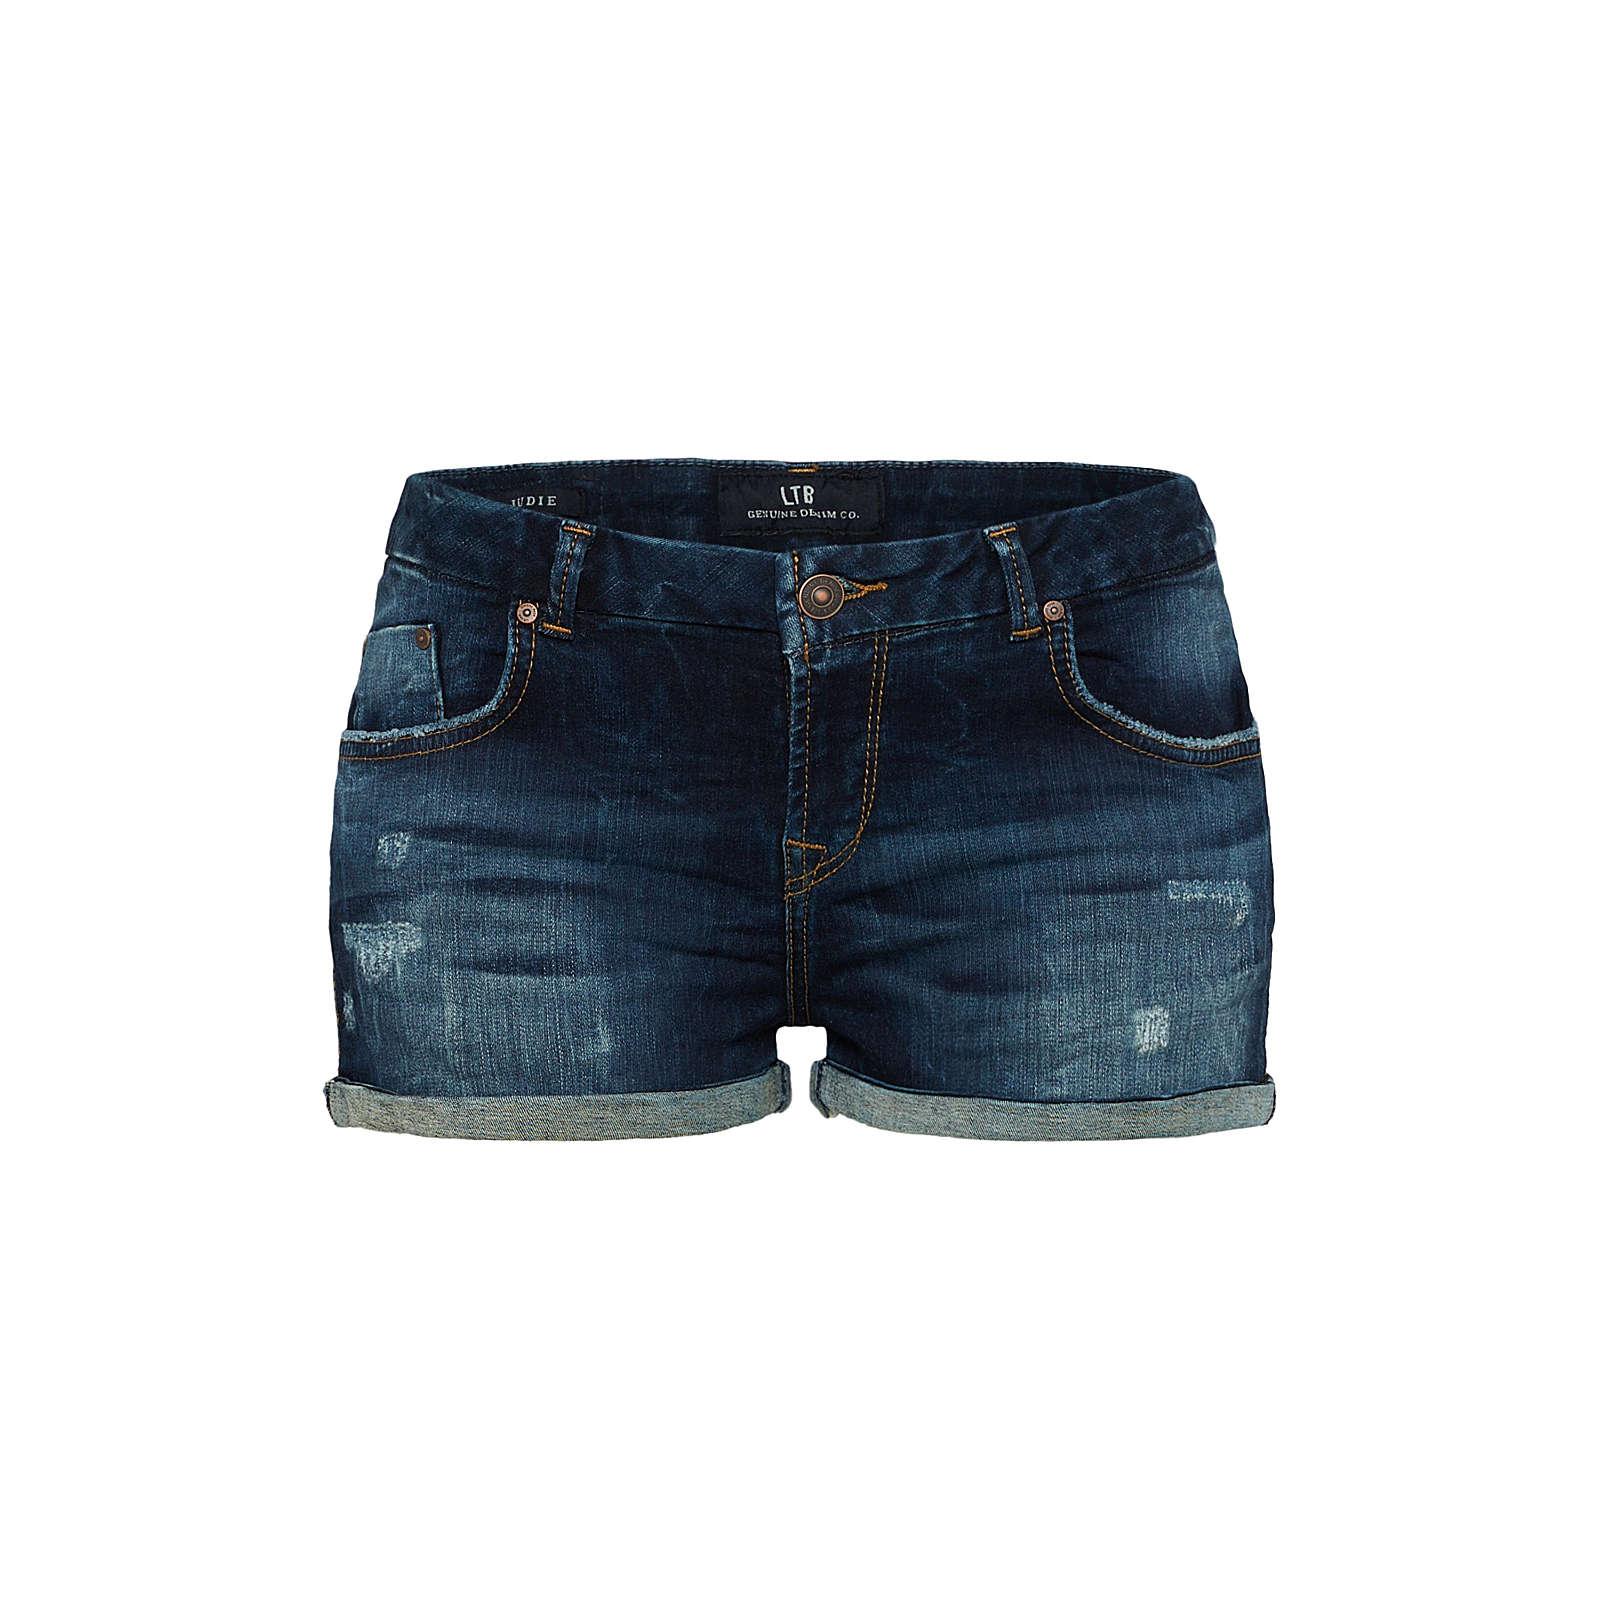 LTB Jeans Jeansshorts blau Damen Gr. 42